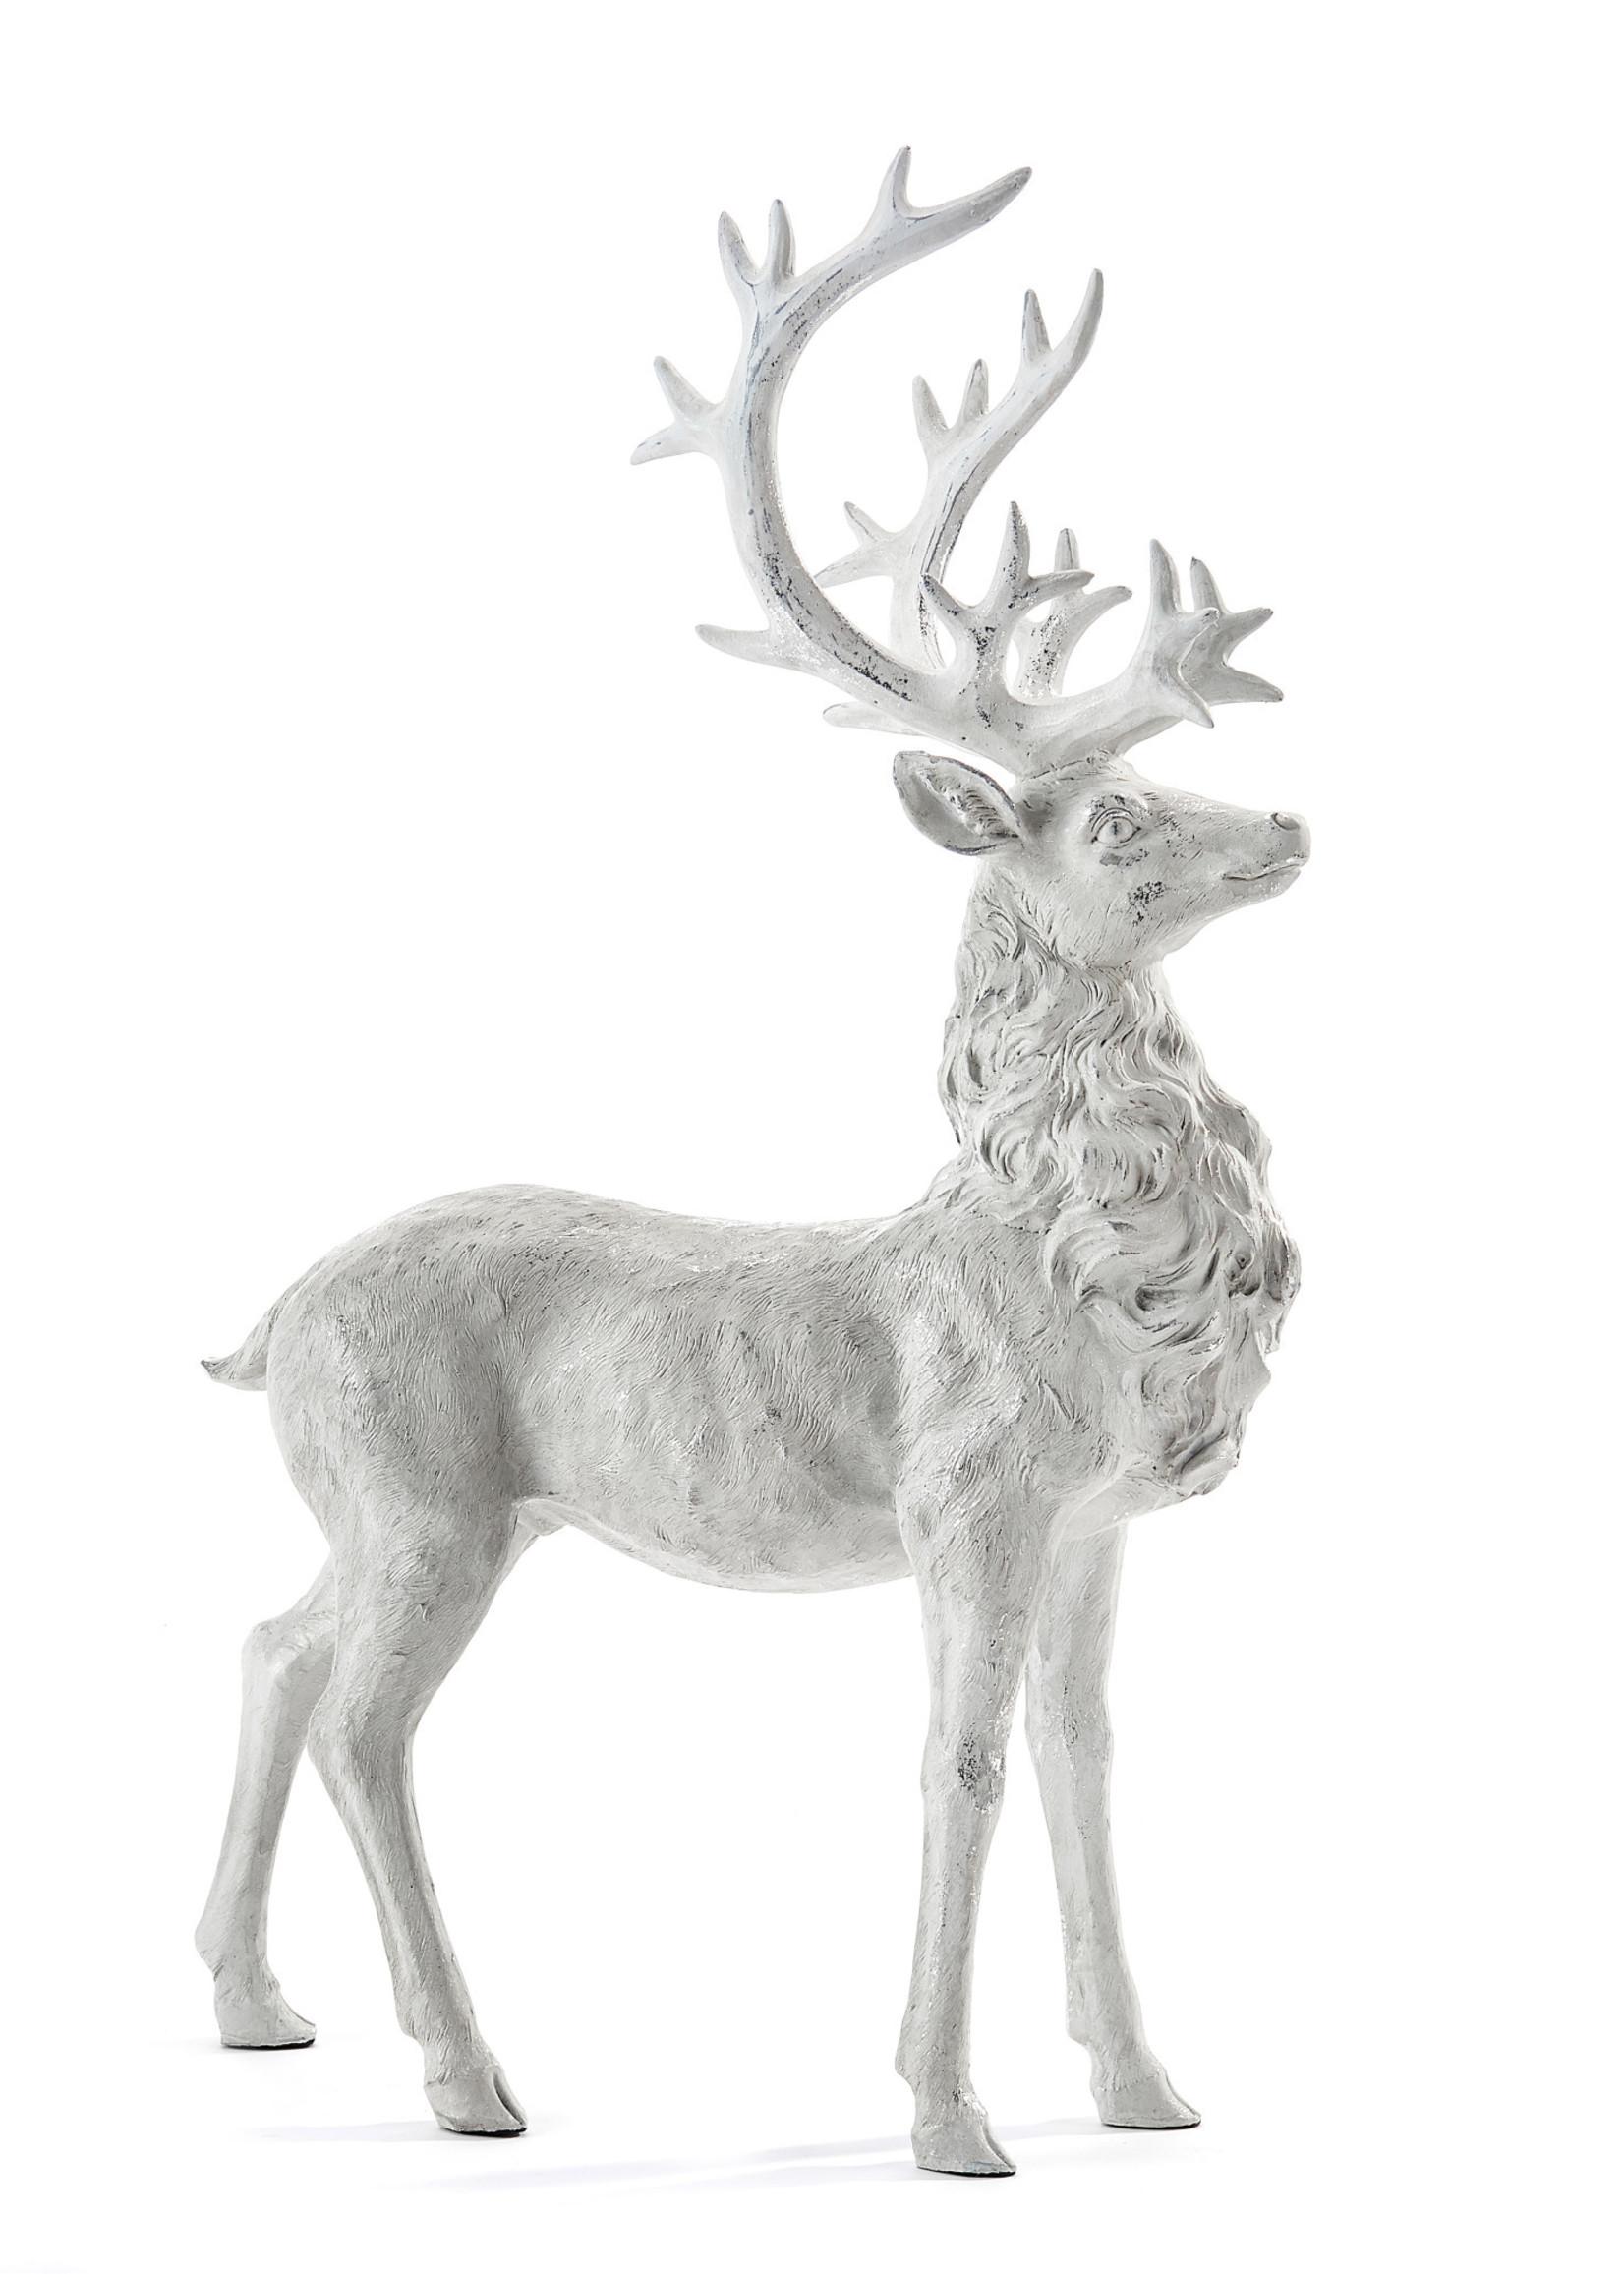 Giftcraft White Reindeer Figurine - Standing